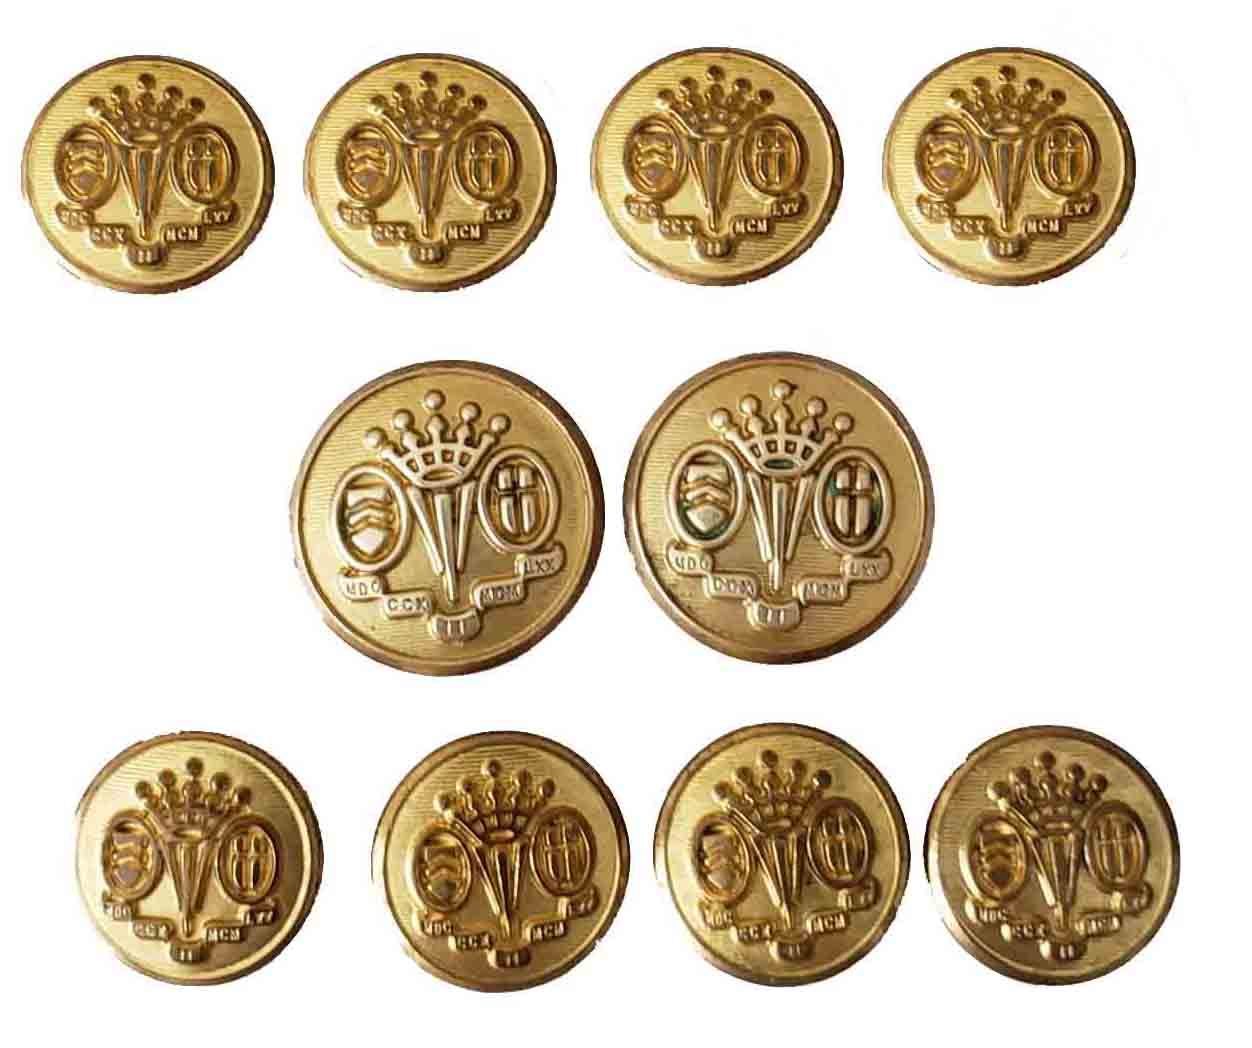 Vintage Waterbury Coronet Blazer Buttons Set Gold Brass Men's